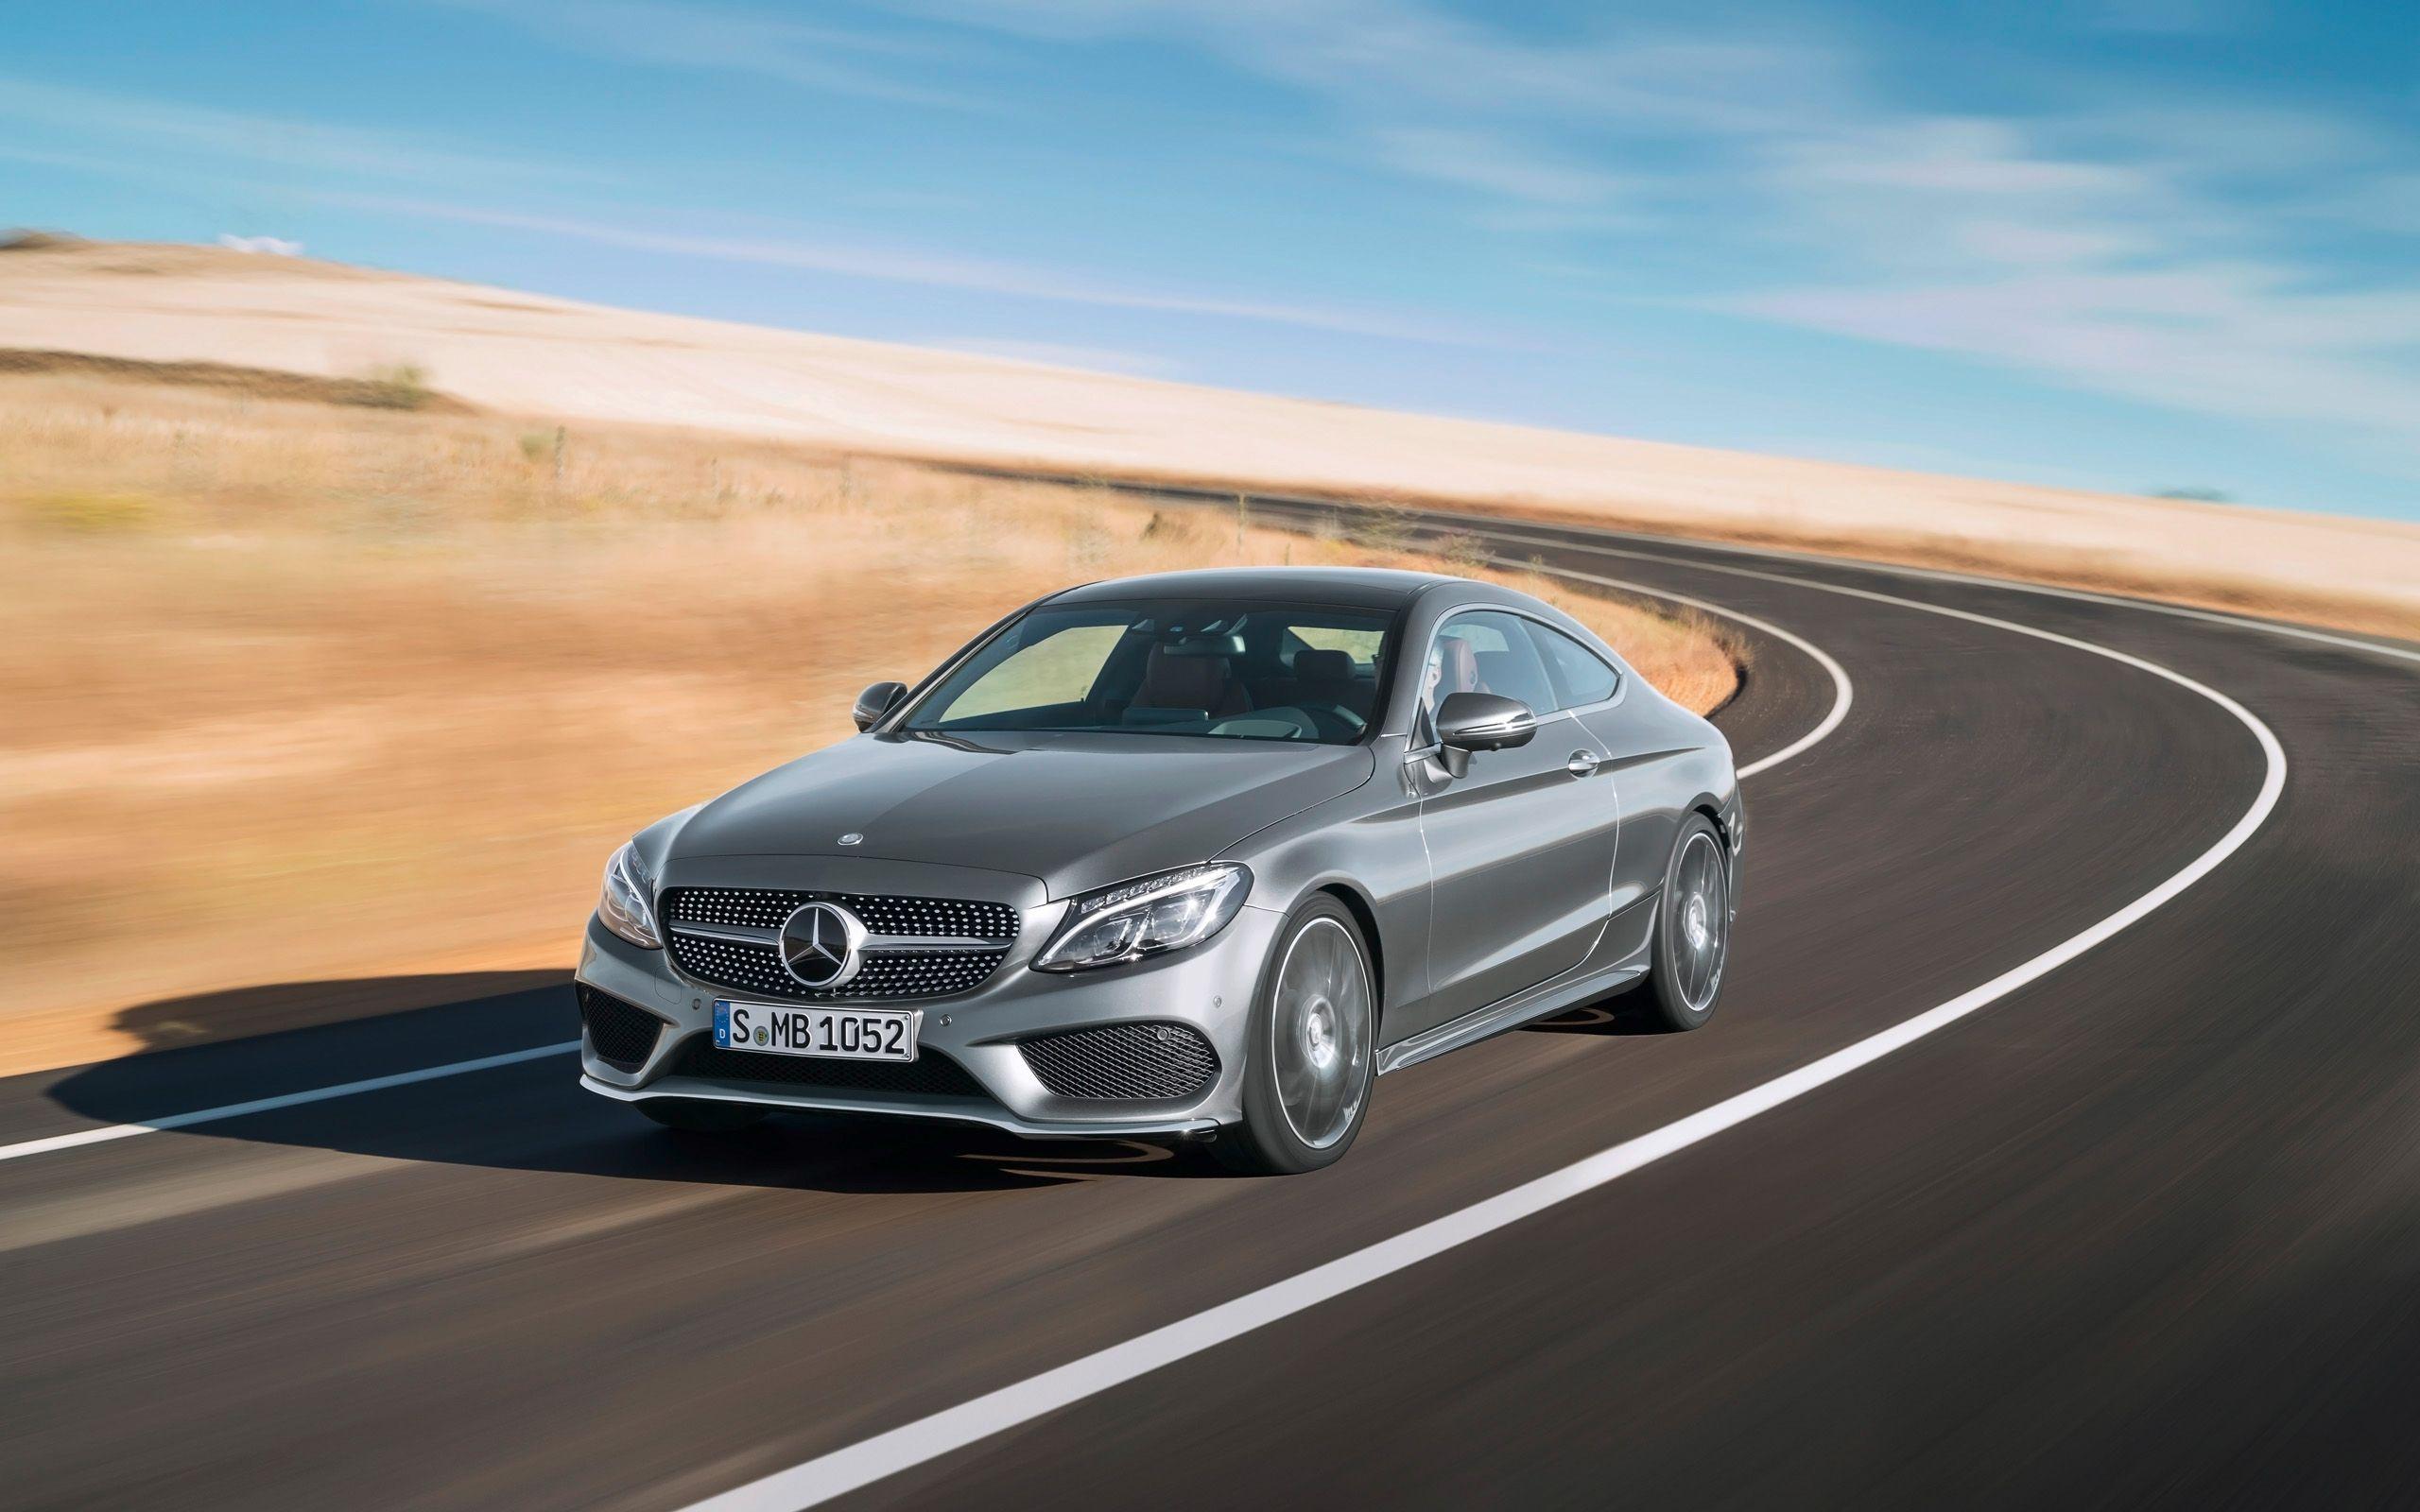 2016 Mercedes Benz C Class Coupe Dream cars Pinterest